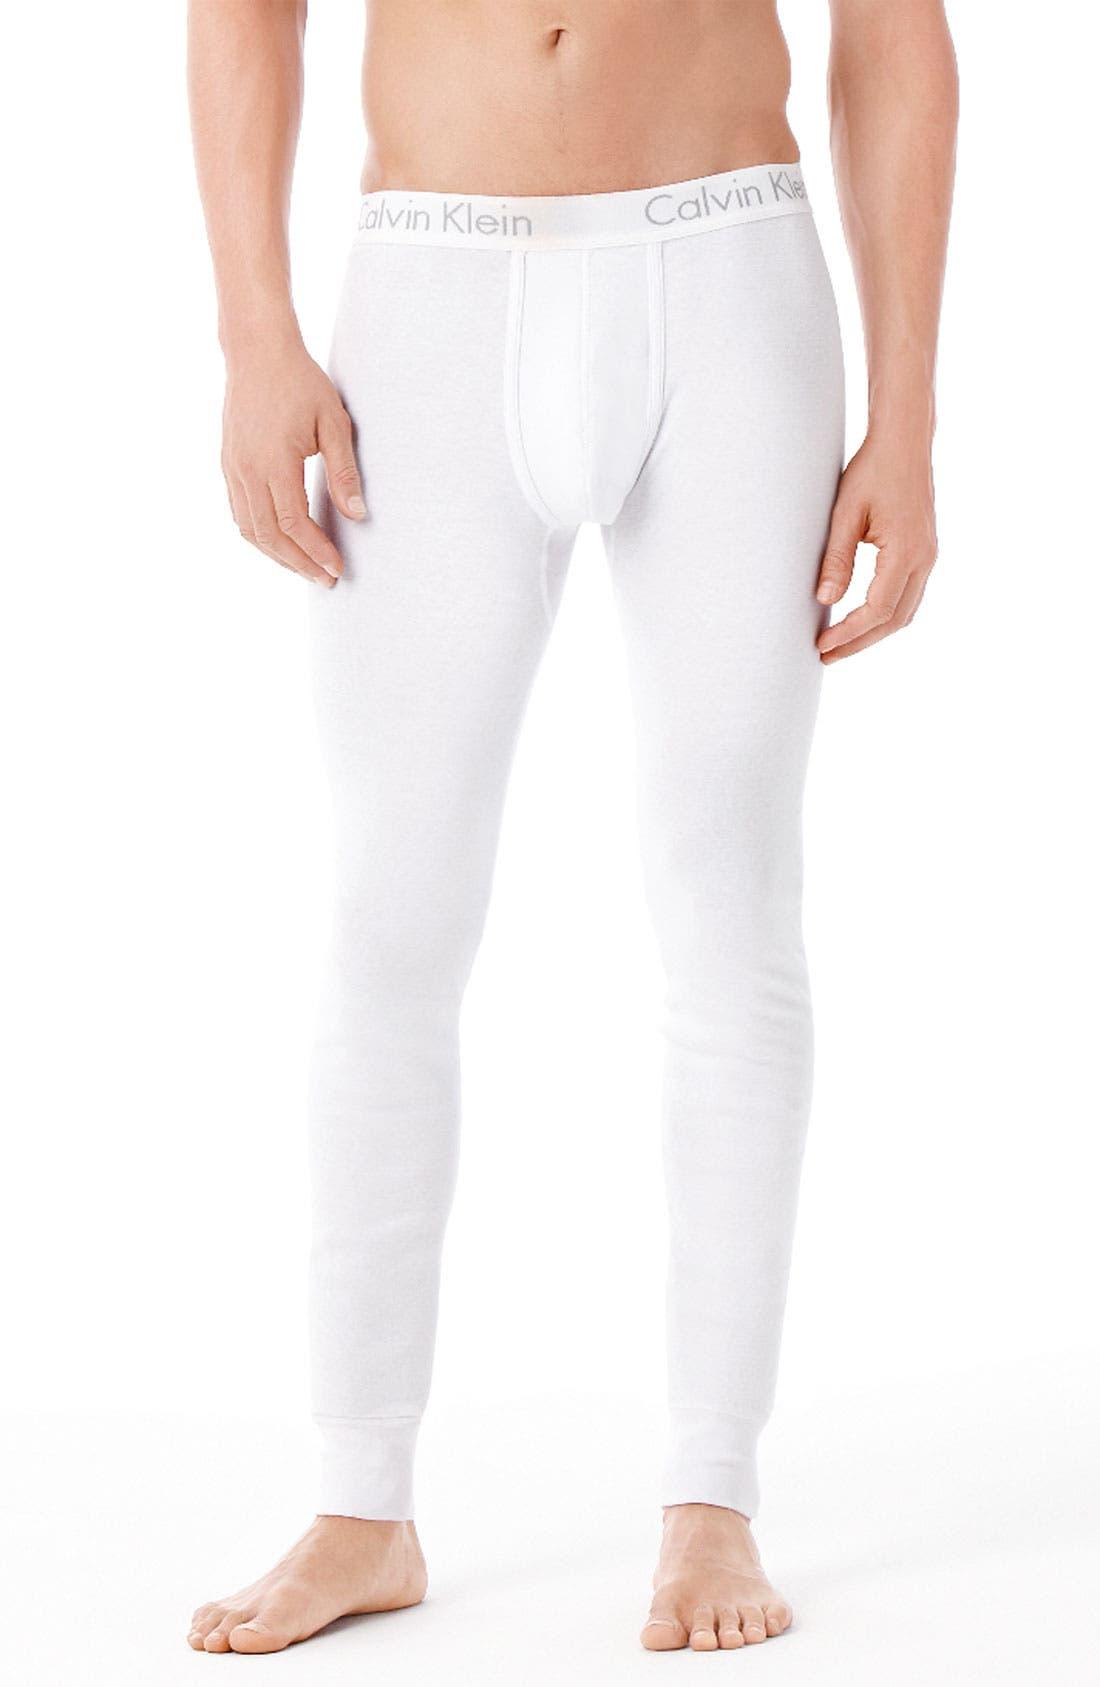 Alternate Image 1 Selected - Calvin Klein 'U1706' Cotton Long Underwear